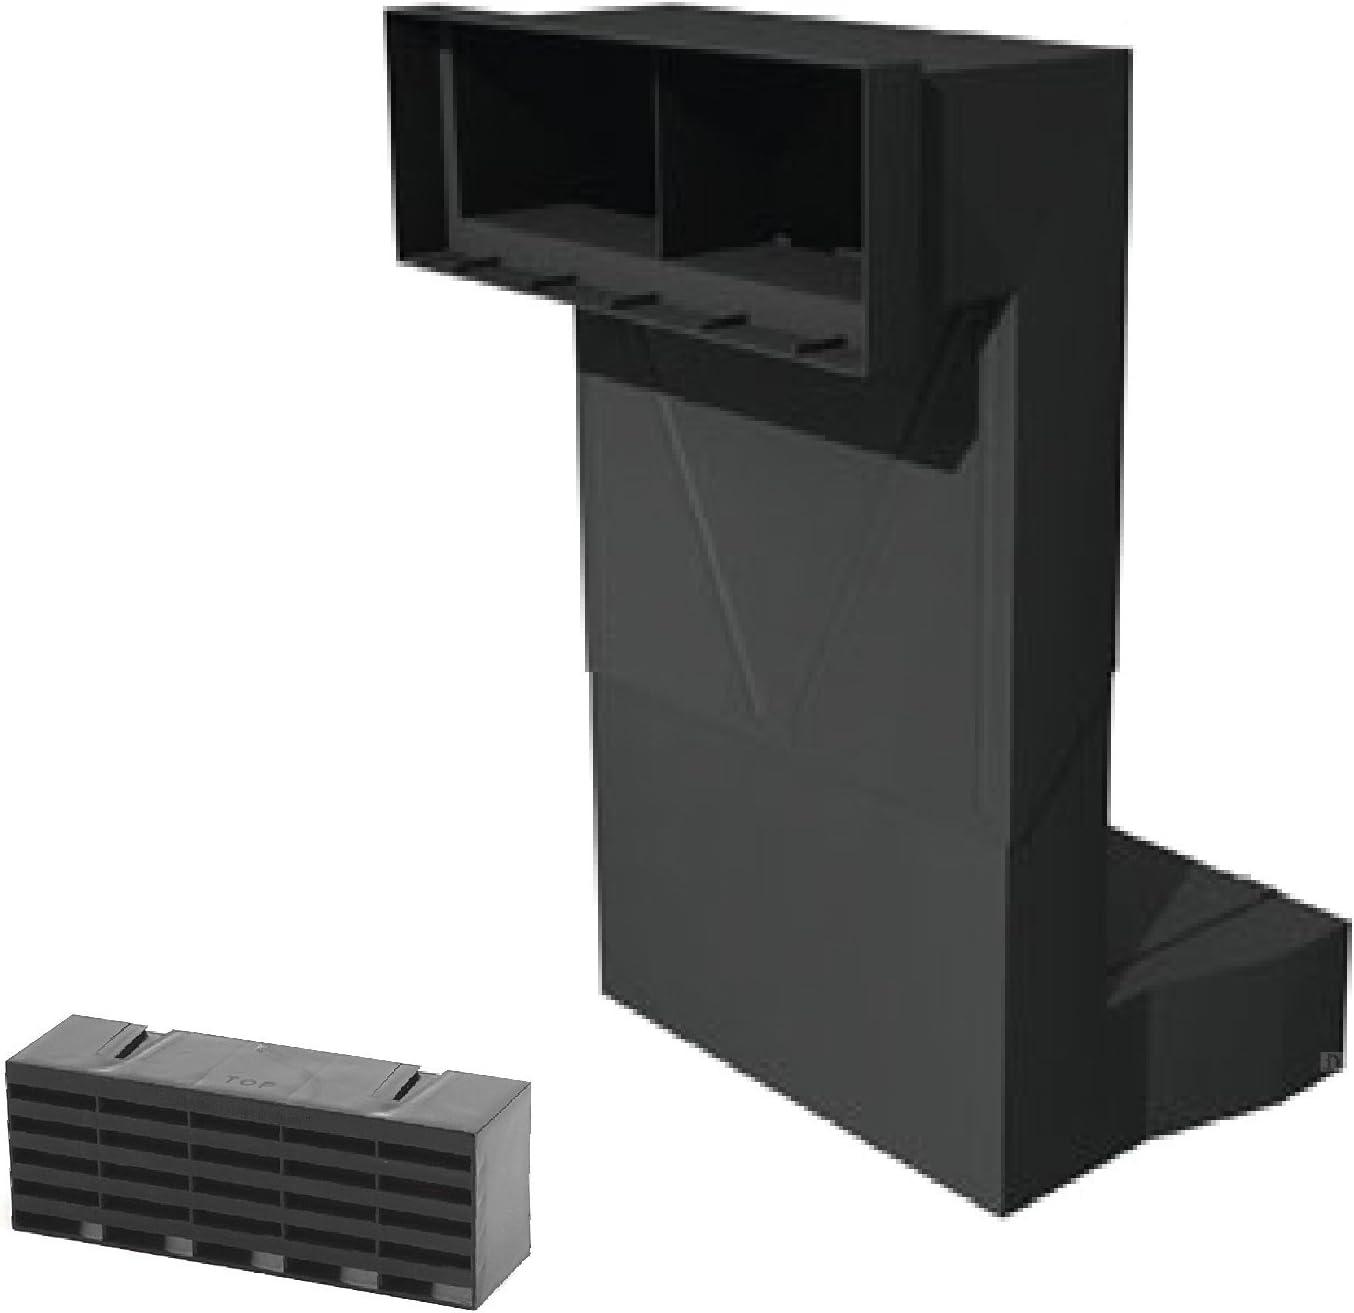 Timloc Telescopic Underfloor Cavity Vent With Air Brick Ventilator Black